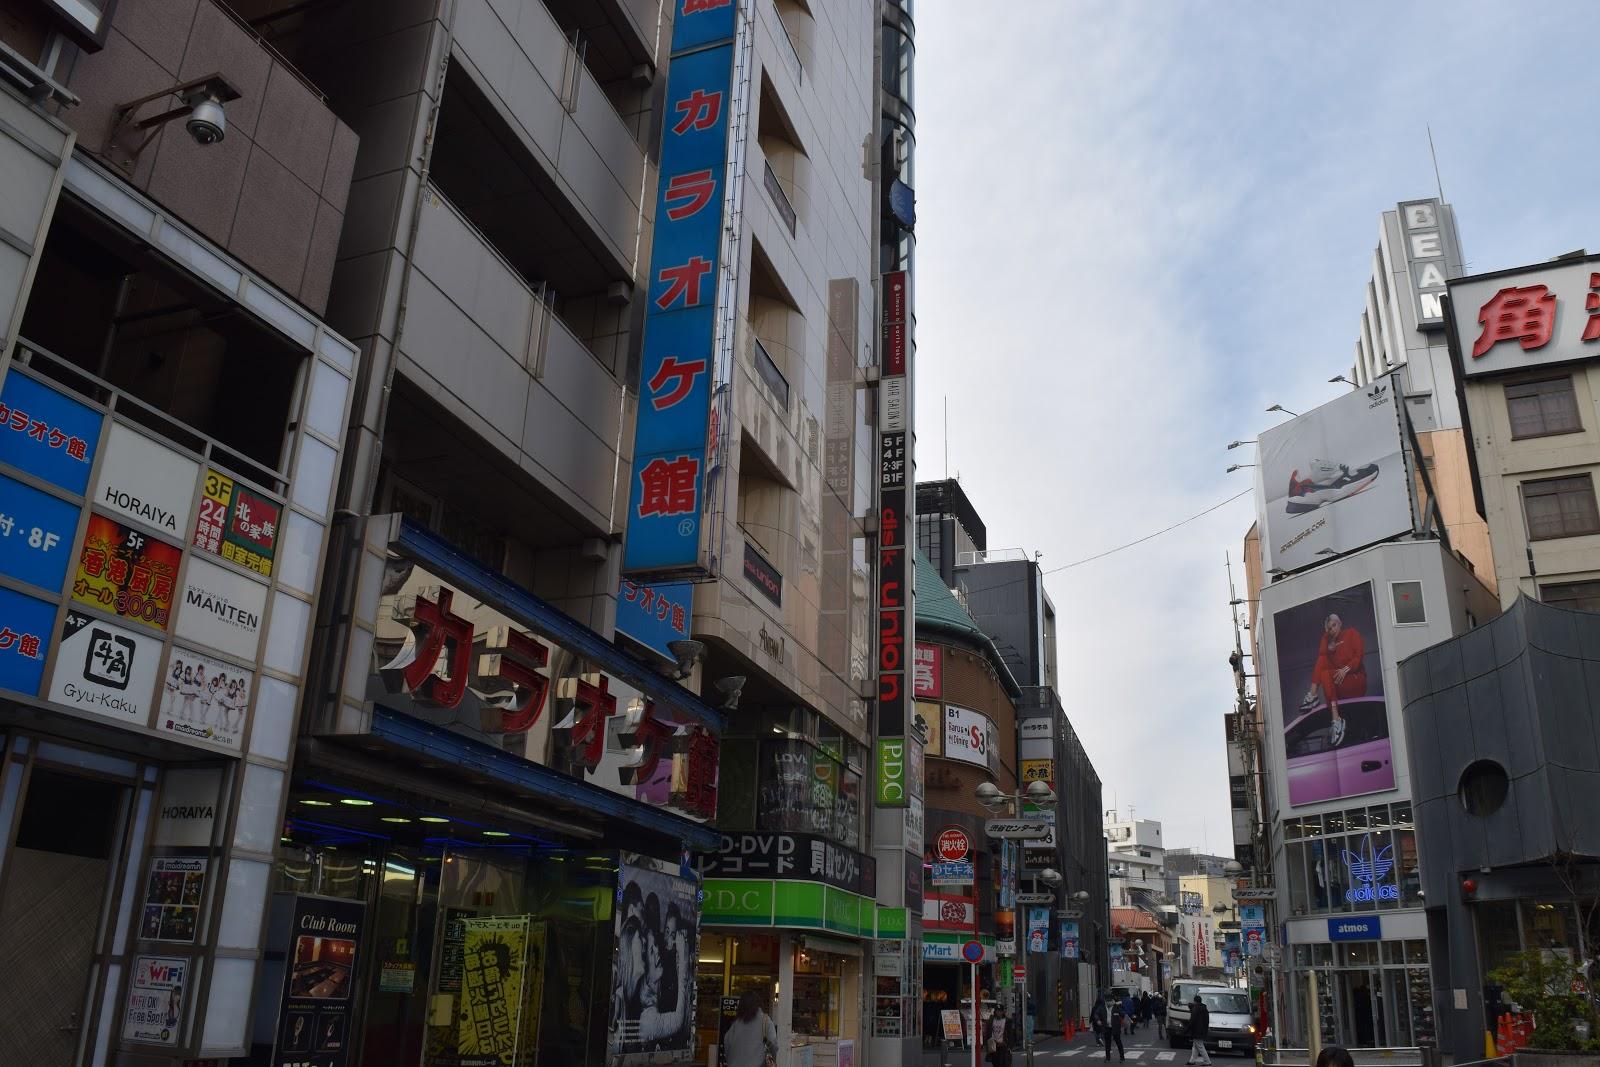 Street in Shibuya, Tokyo